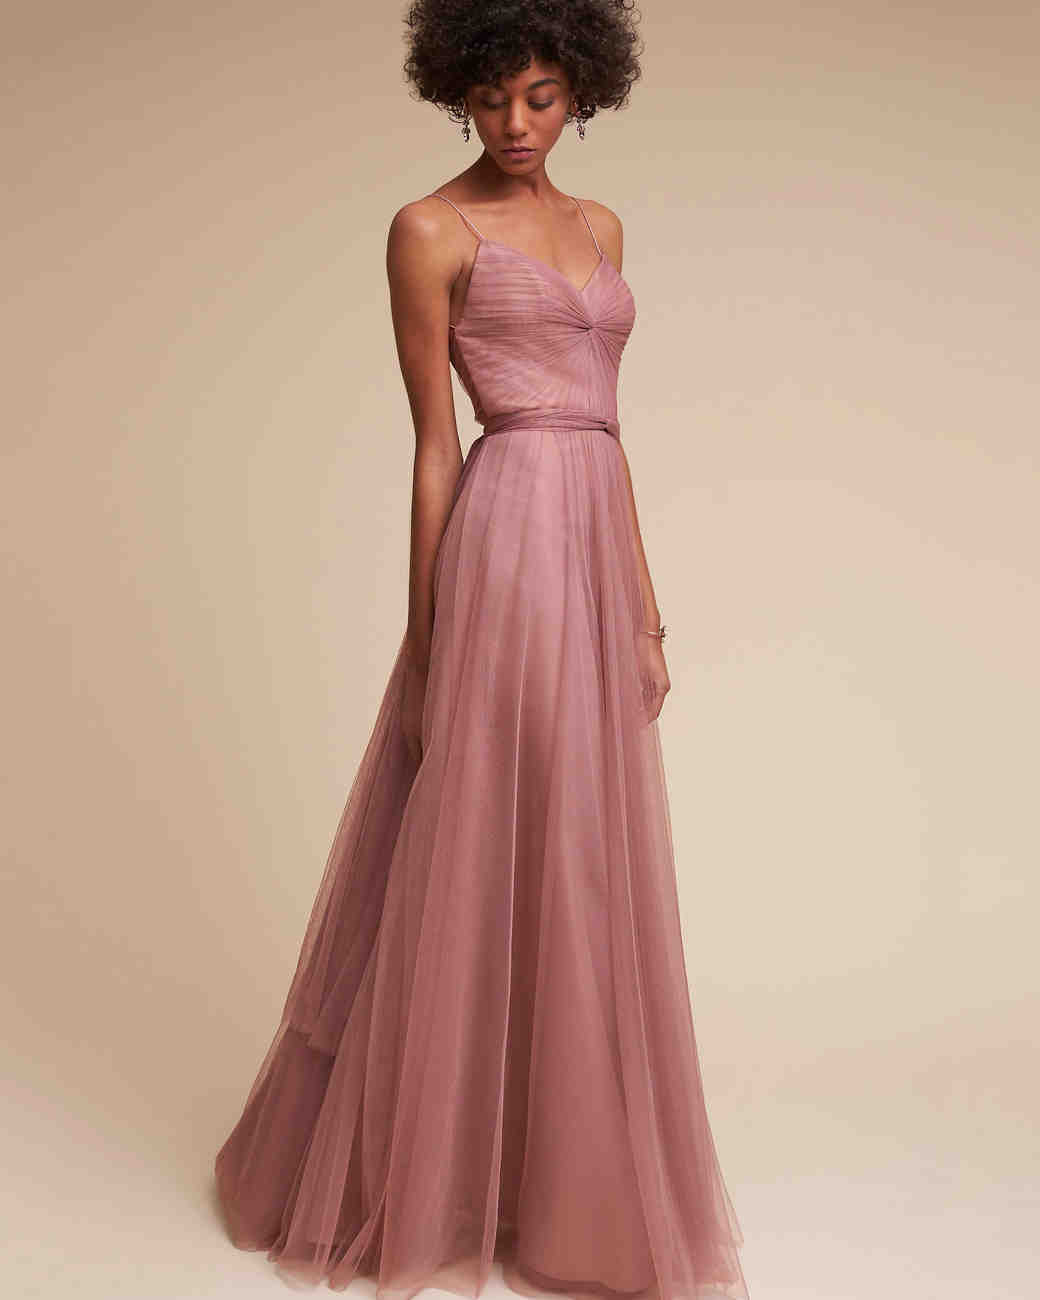 Spaghetti Strap Bridesmaid Dress